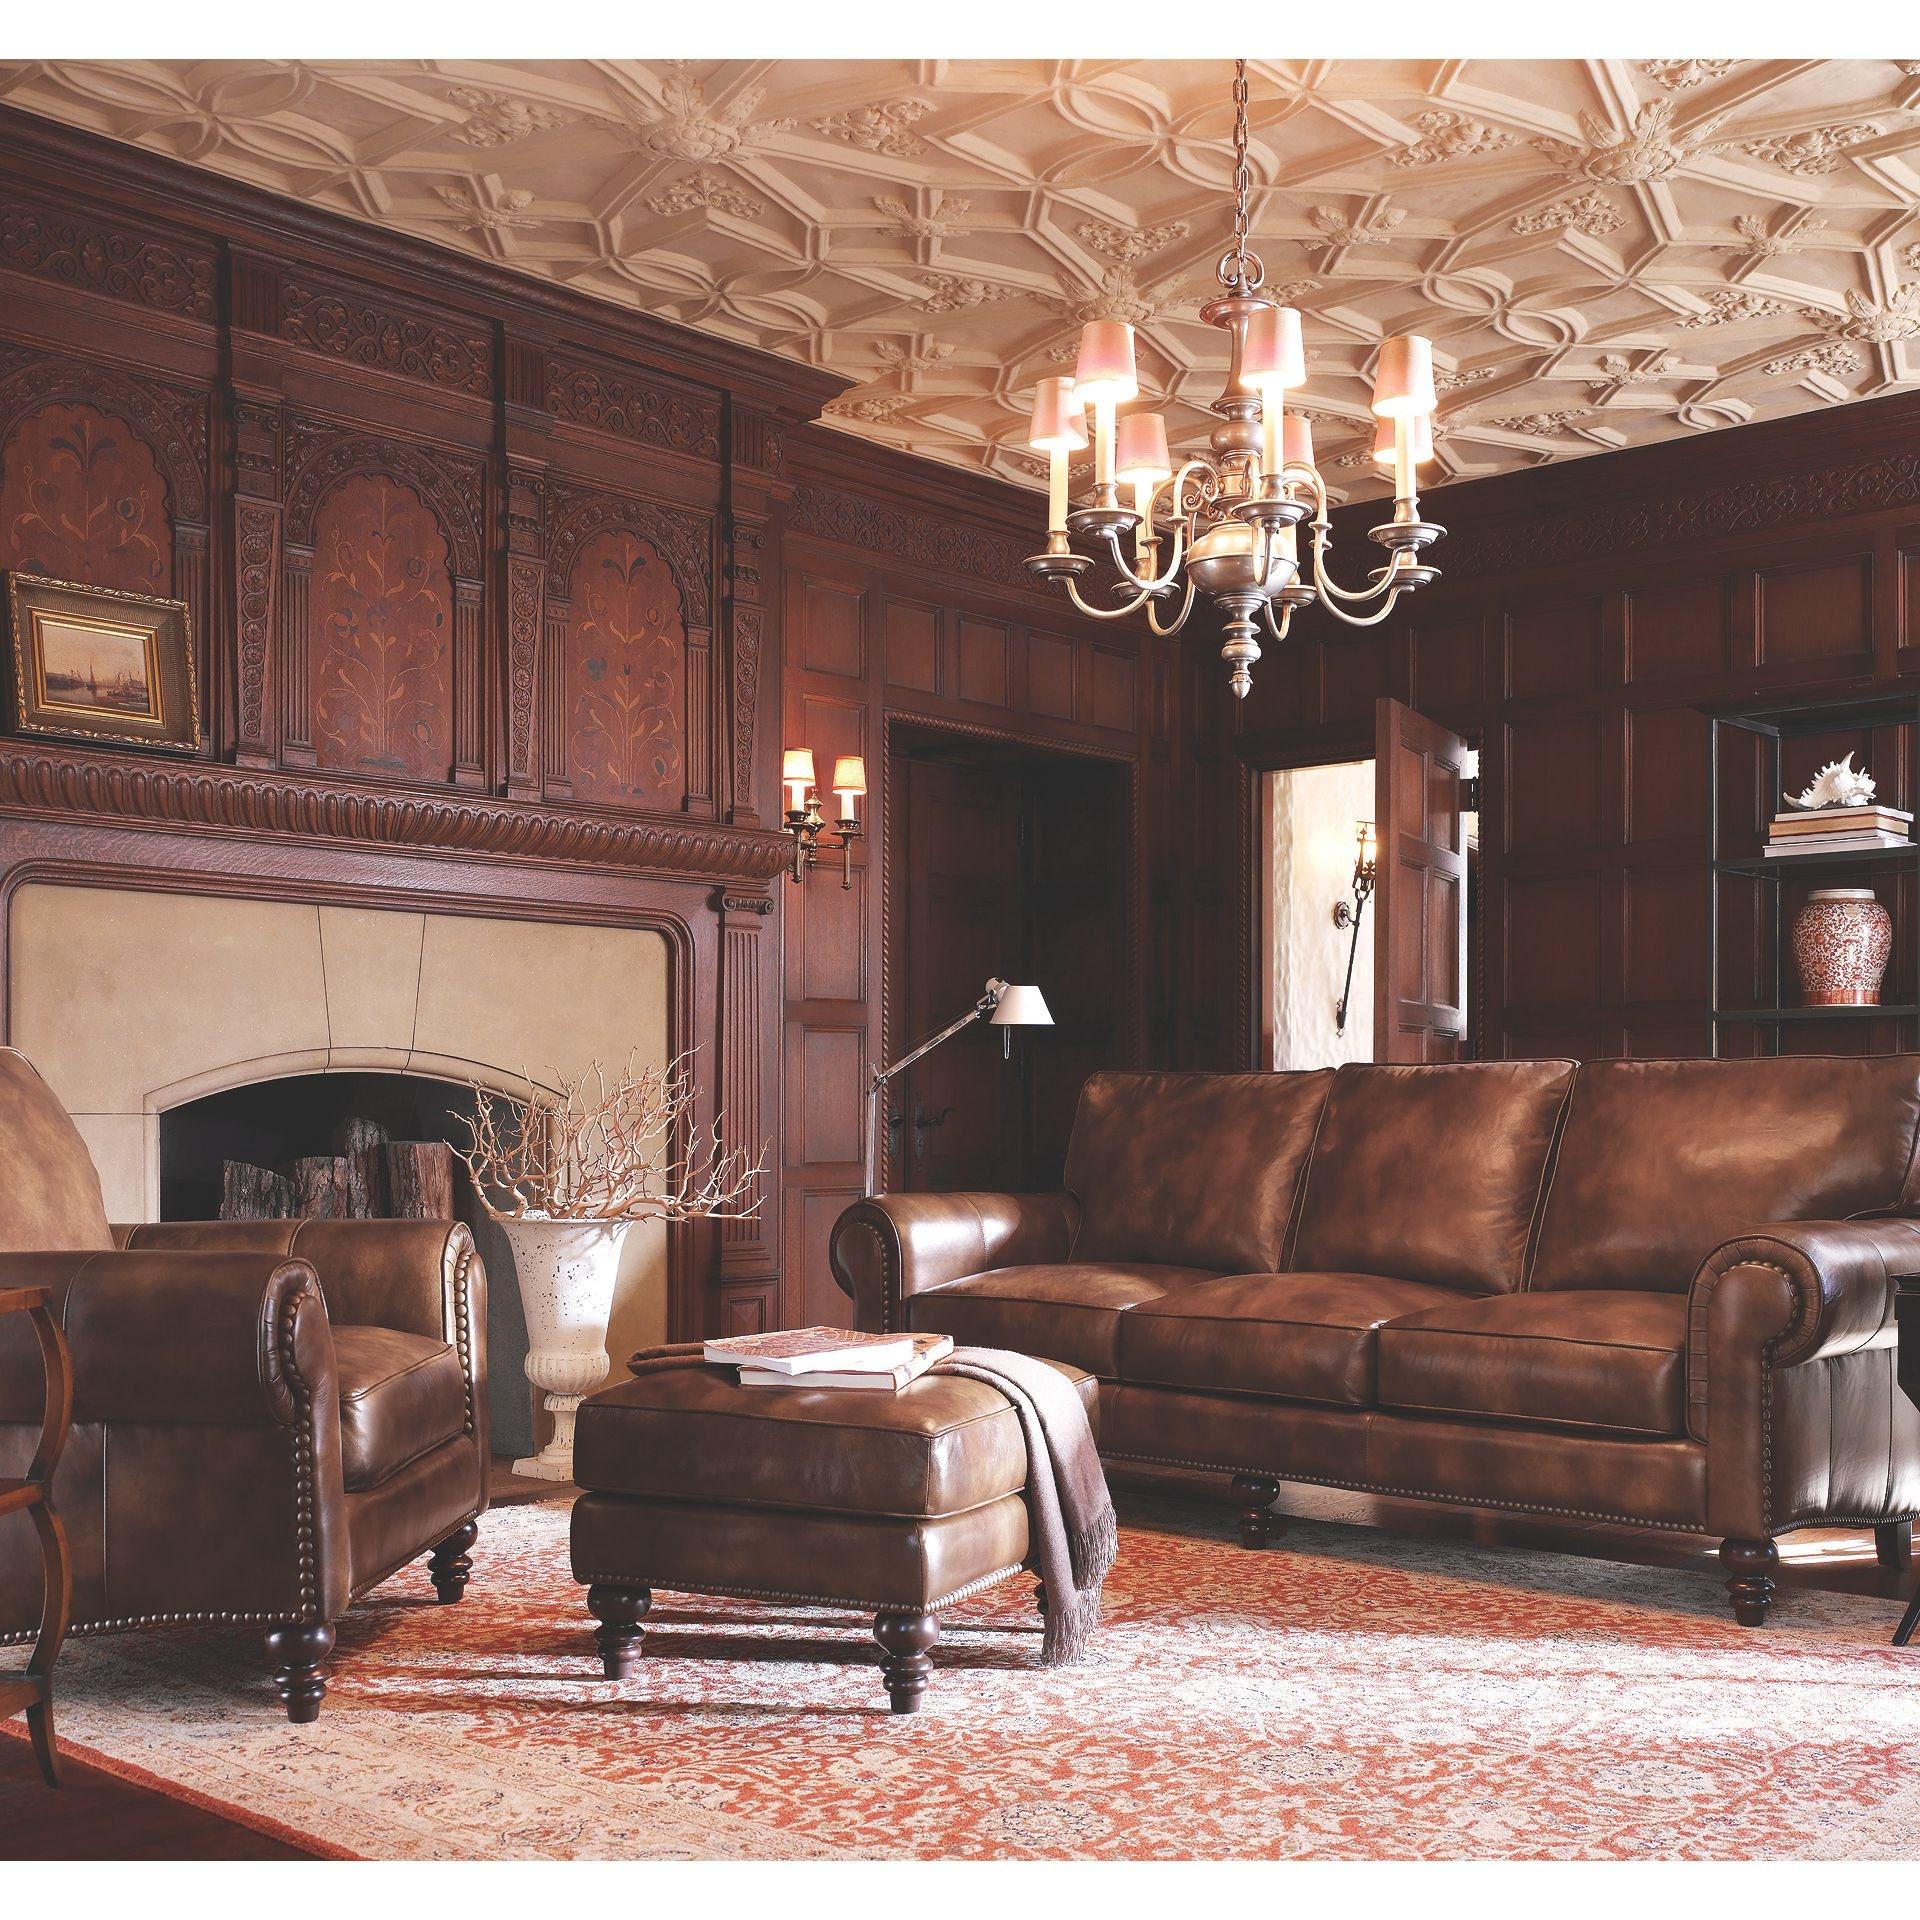 Henredon Furniture Henredon Leather Company Austin Sofa IL7742-C  sc 1 st  Goodu0027s Home Furnishings & Henredon Furniture IL7742-C Living Room Henredon Leather Company ... islam-shia.org